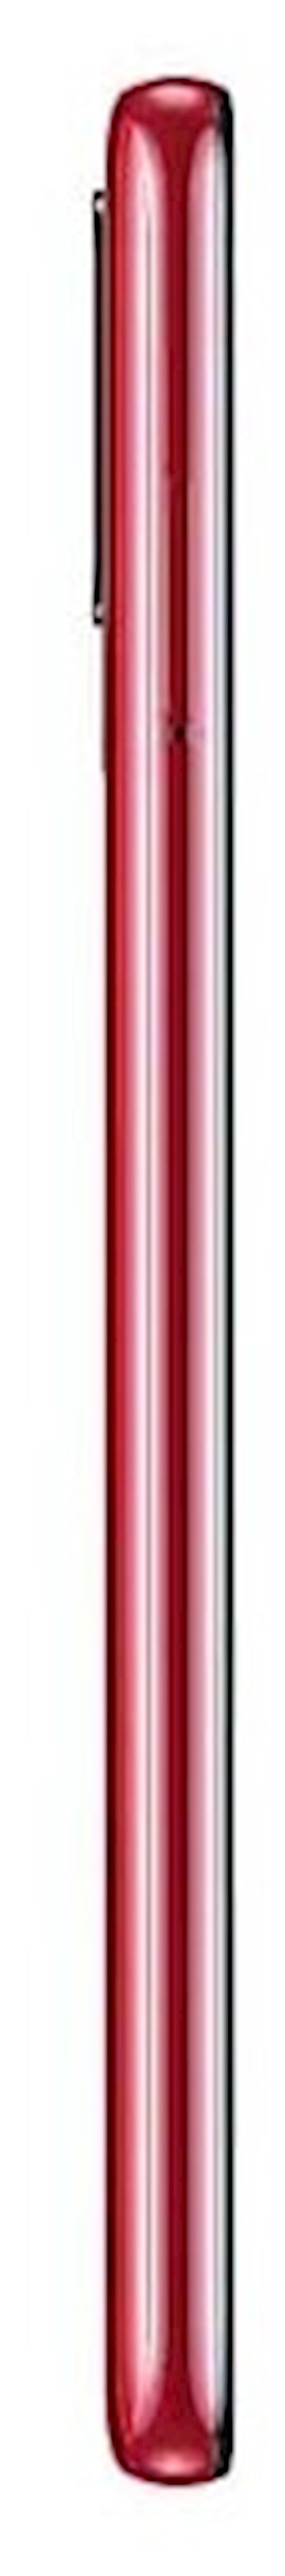 Smartfon Samsung Galaxy A21s 64GB Red